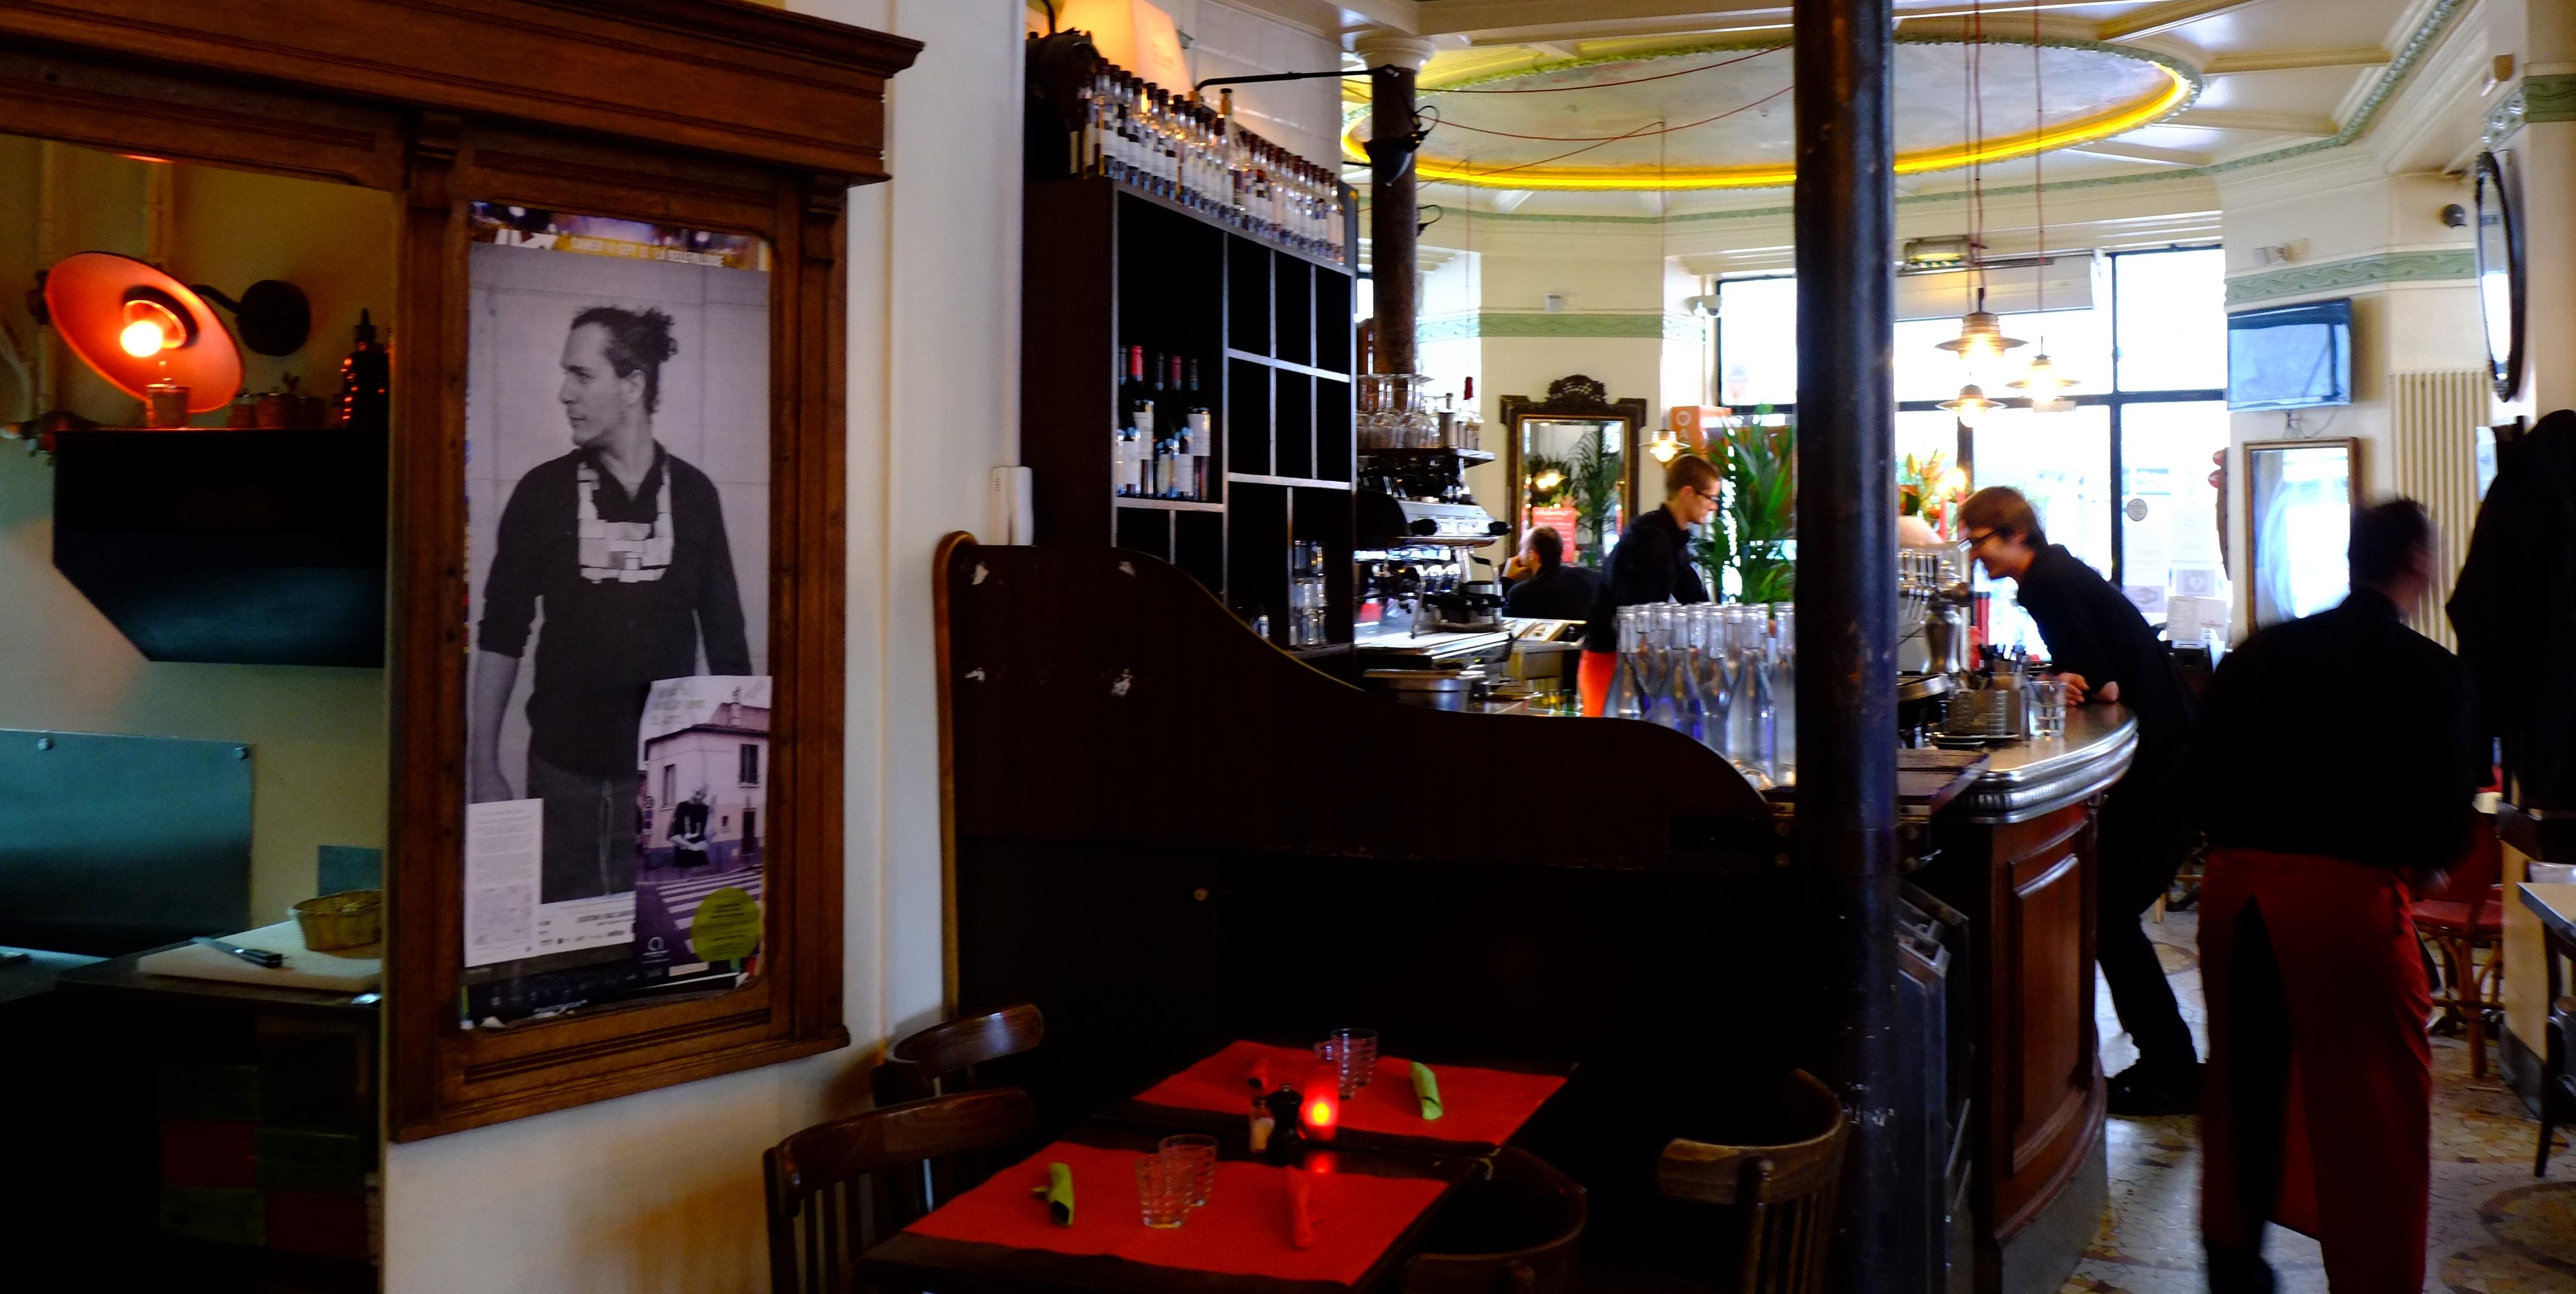 le bar Les funambules